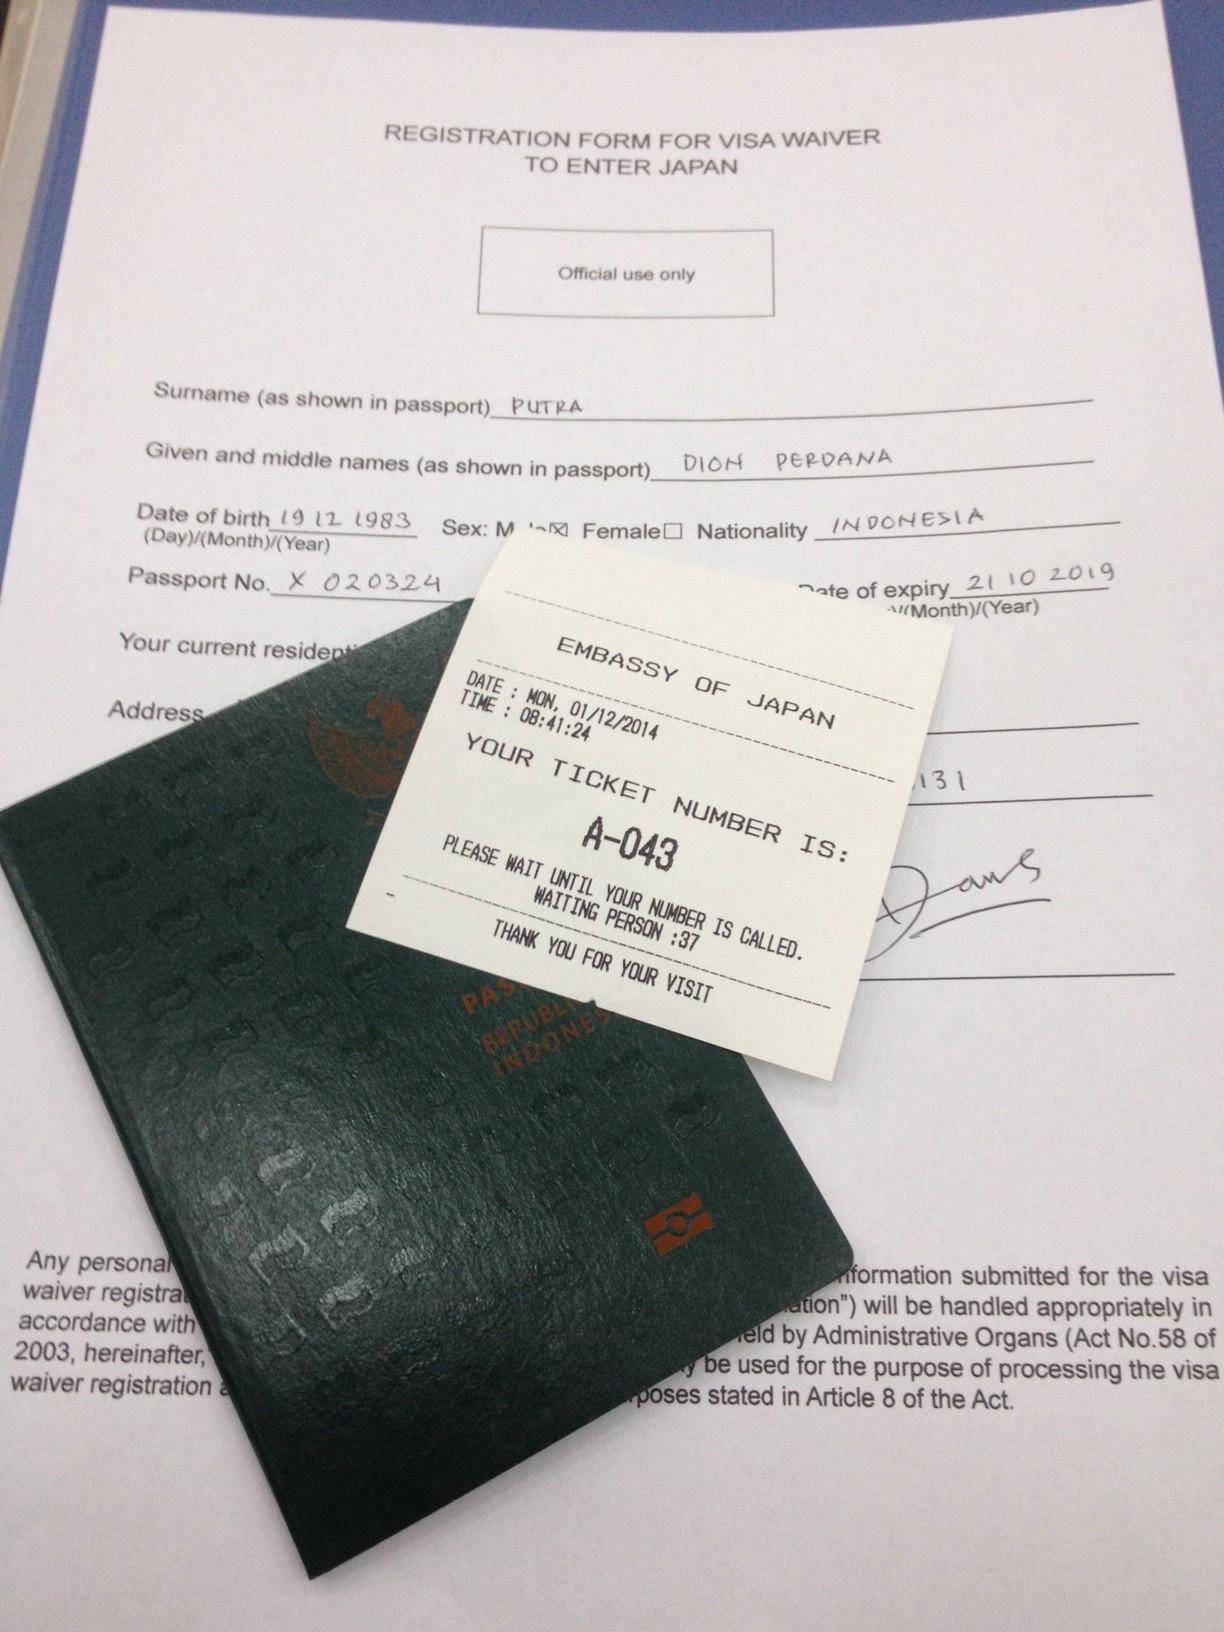 epaspor dan form registrasi bebas visa